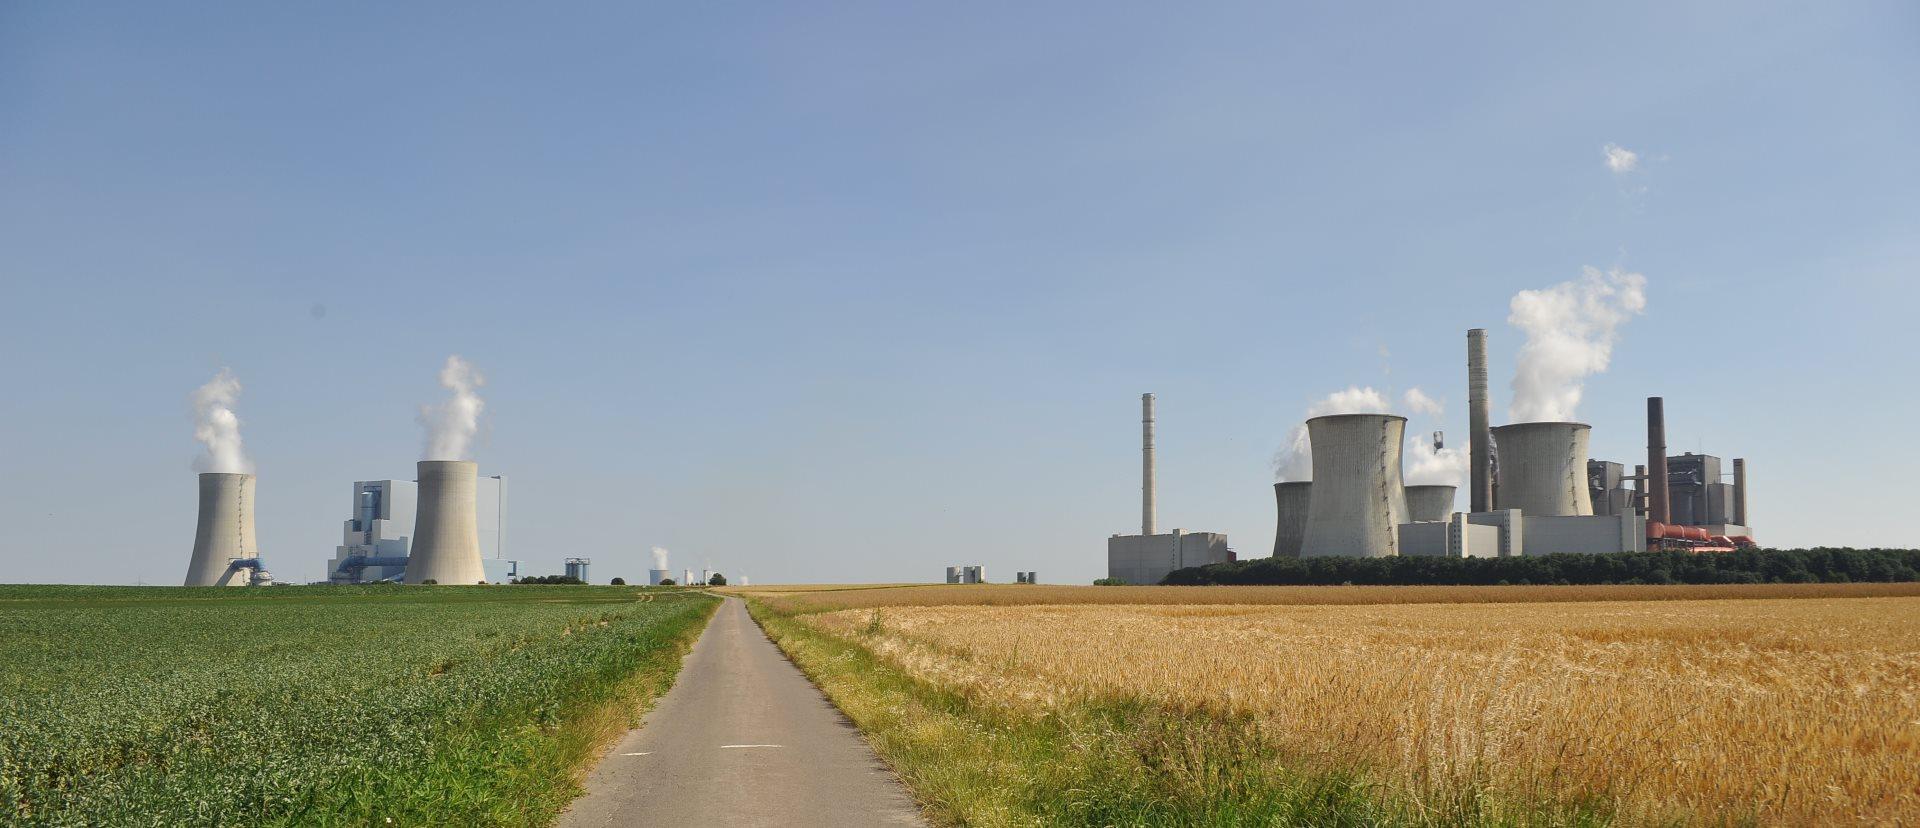 Lignite power plant Neurath